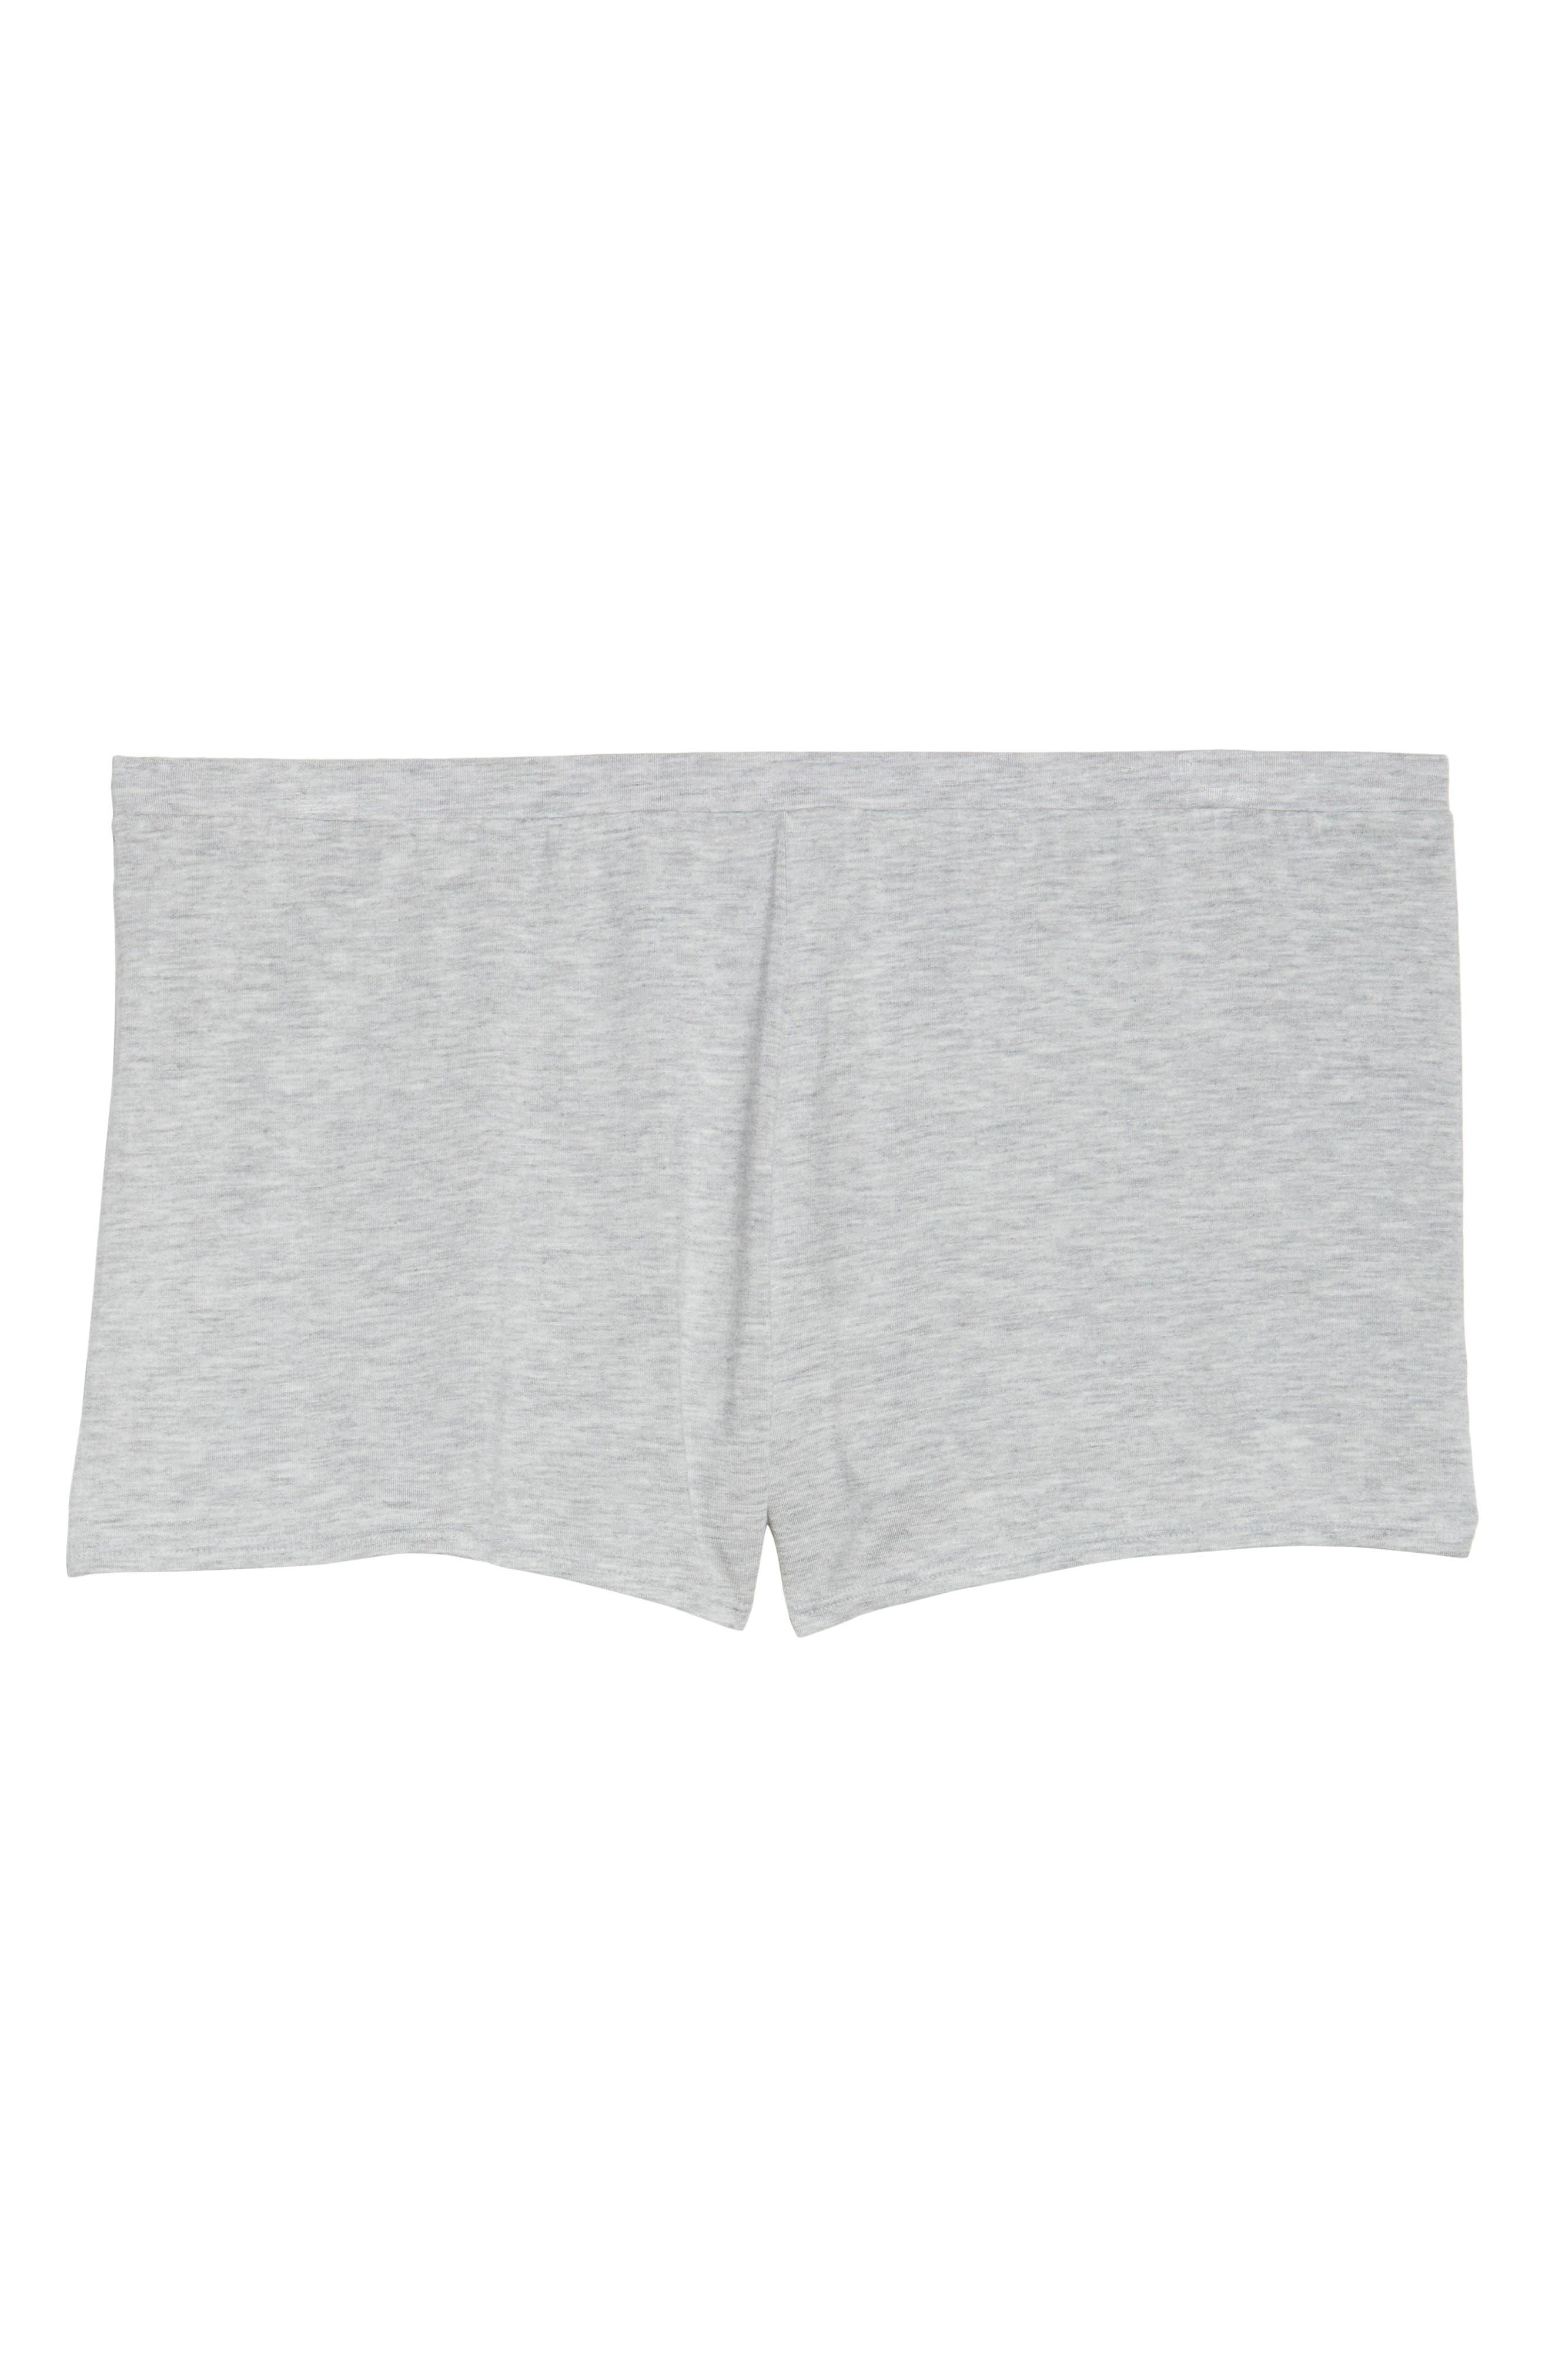 Undressed Pajama Shorts,                             Alternate thumbnail 12, color,